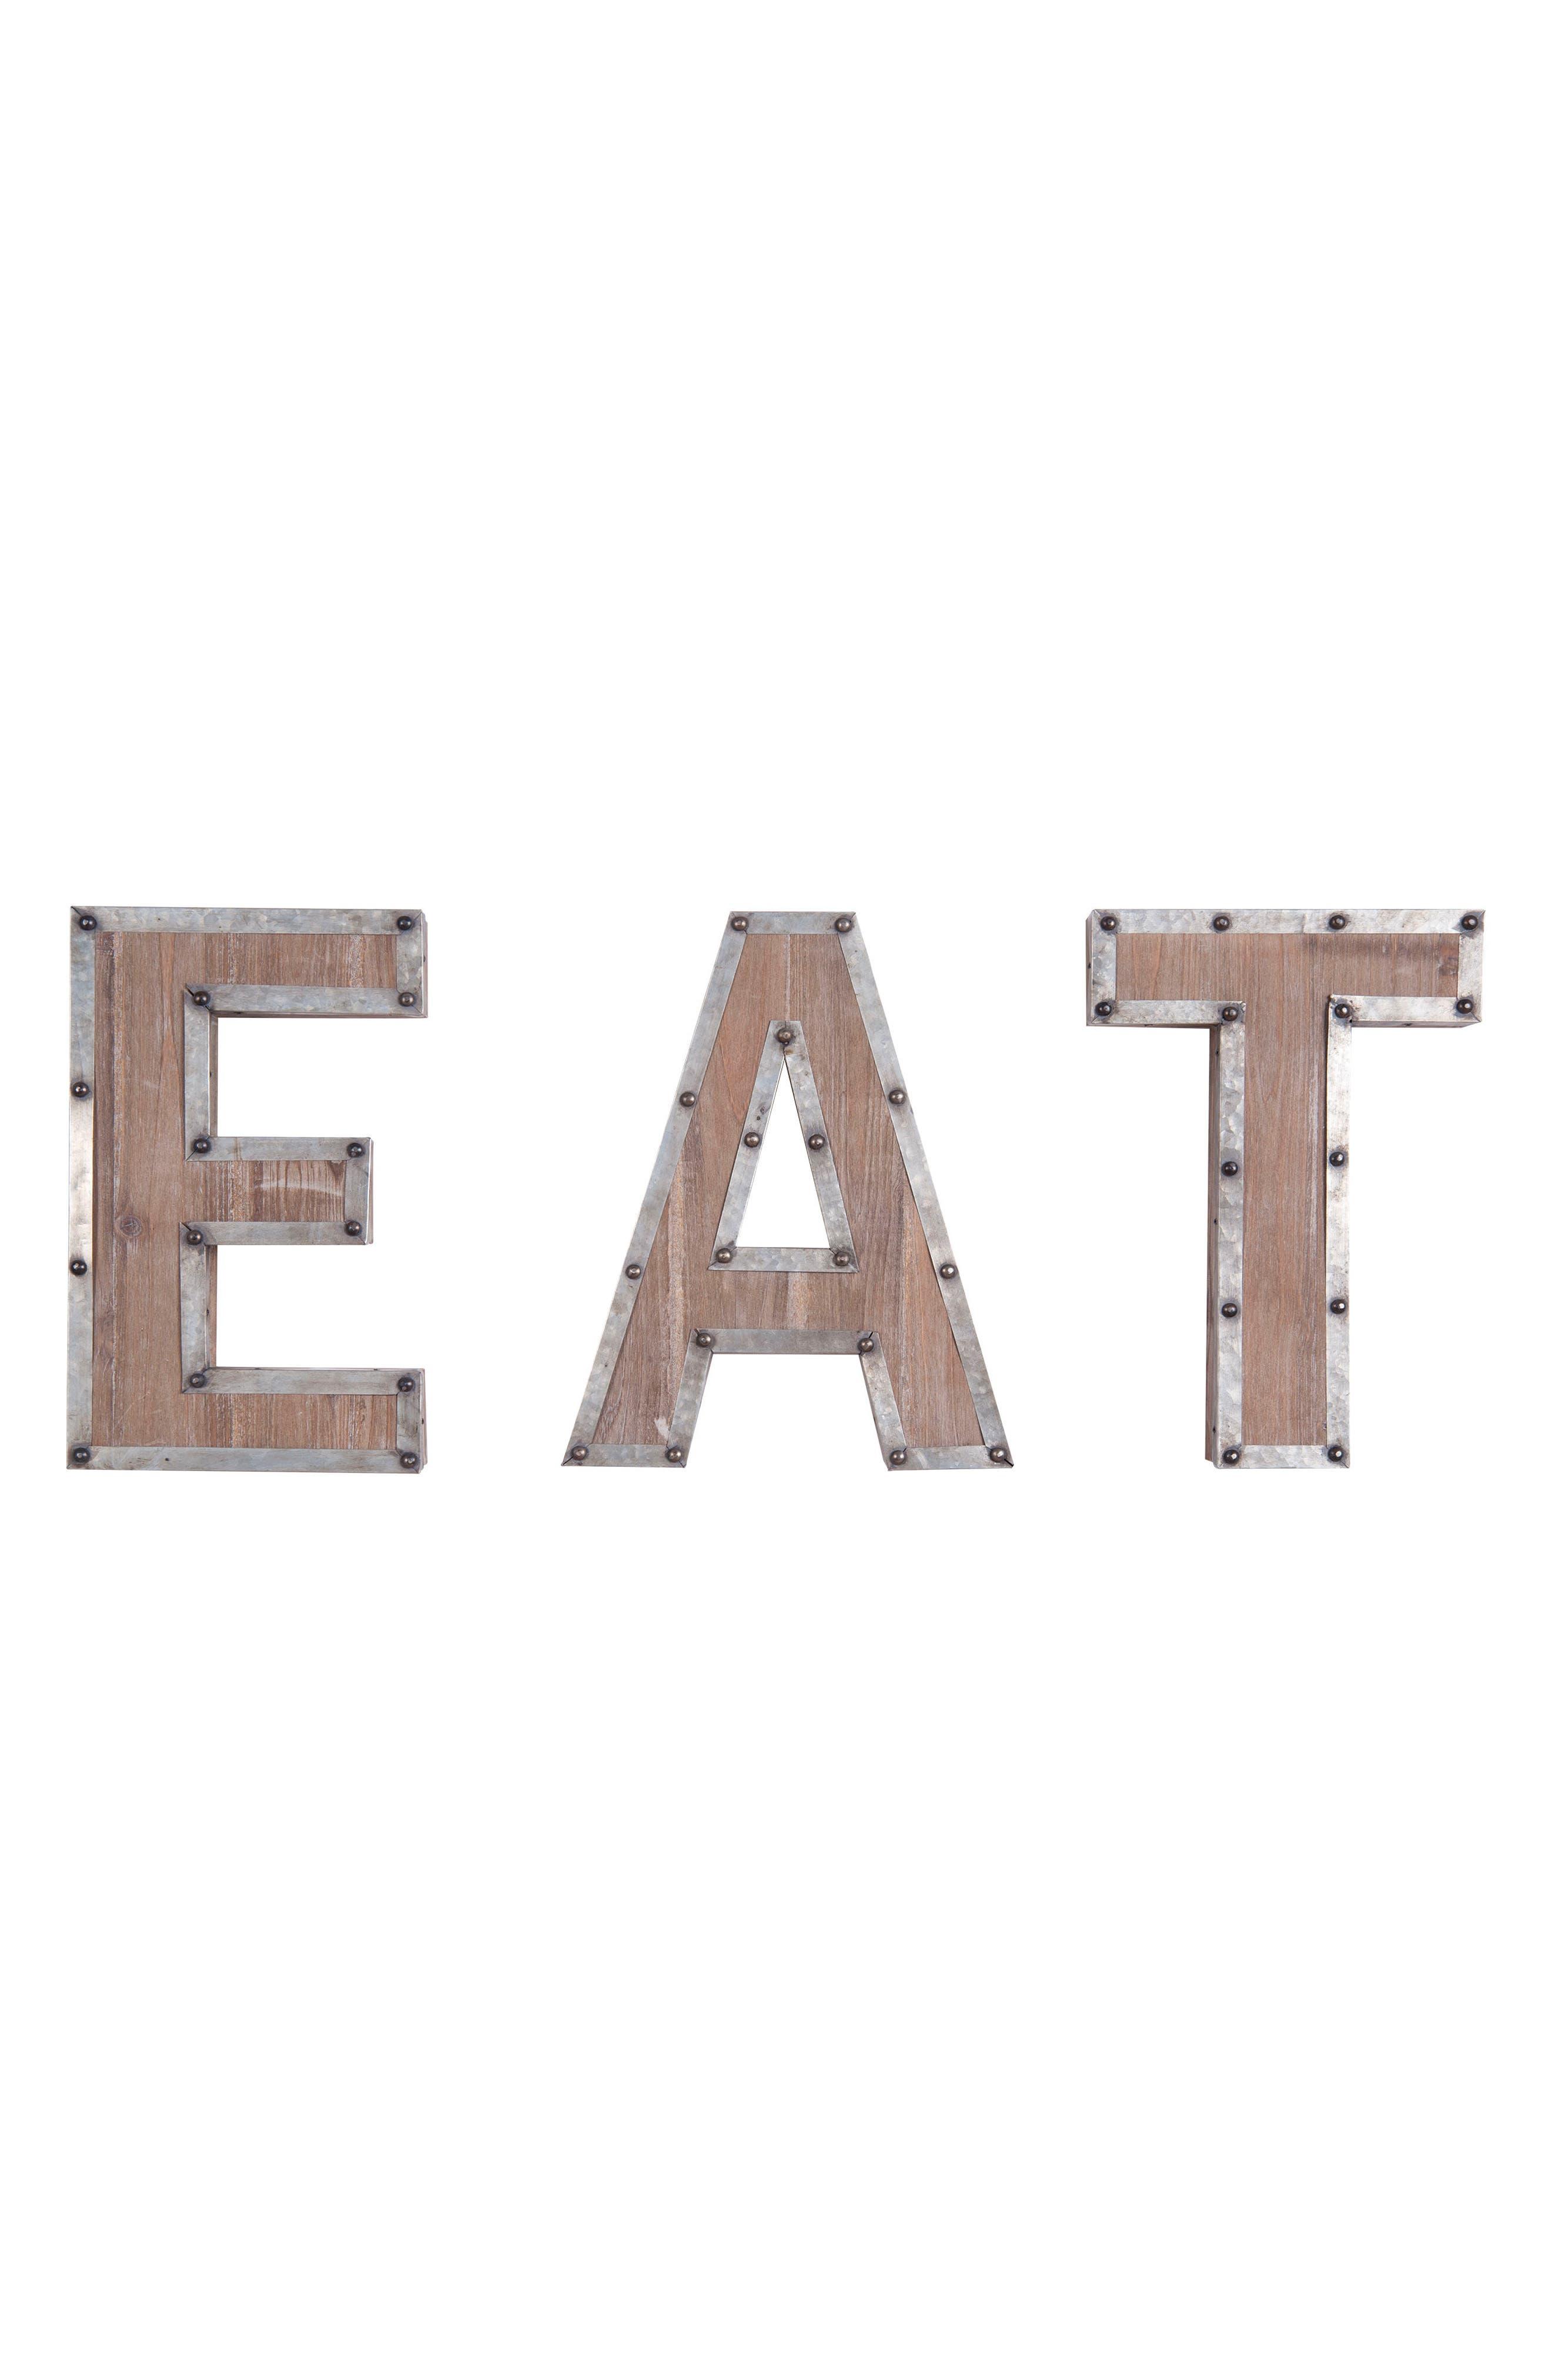 Alternate Image 1 Selected - Foreside Ashville - Eat Wall Art